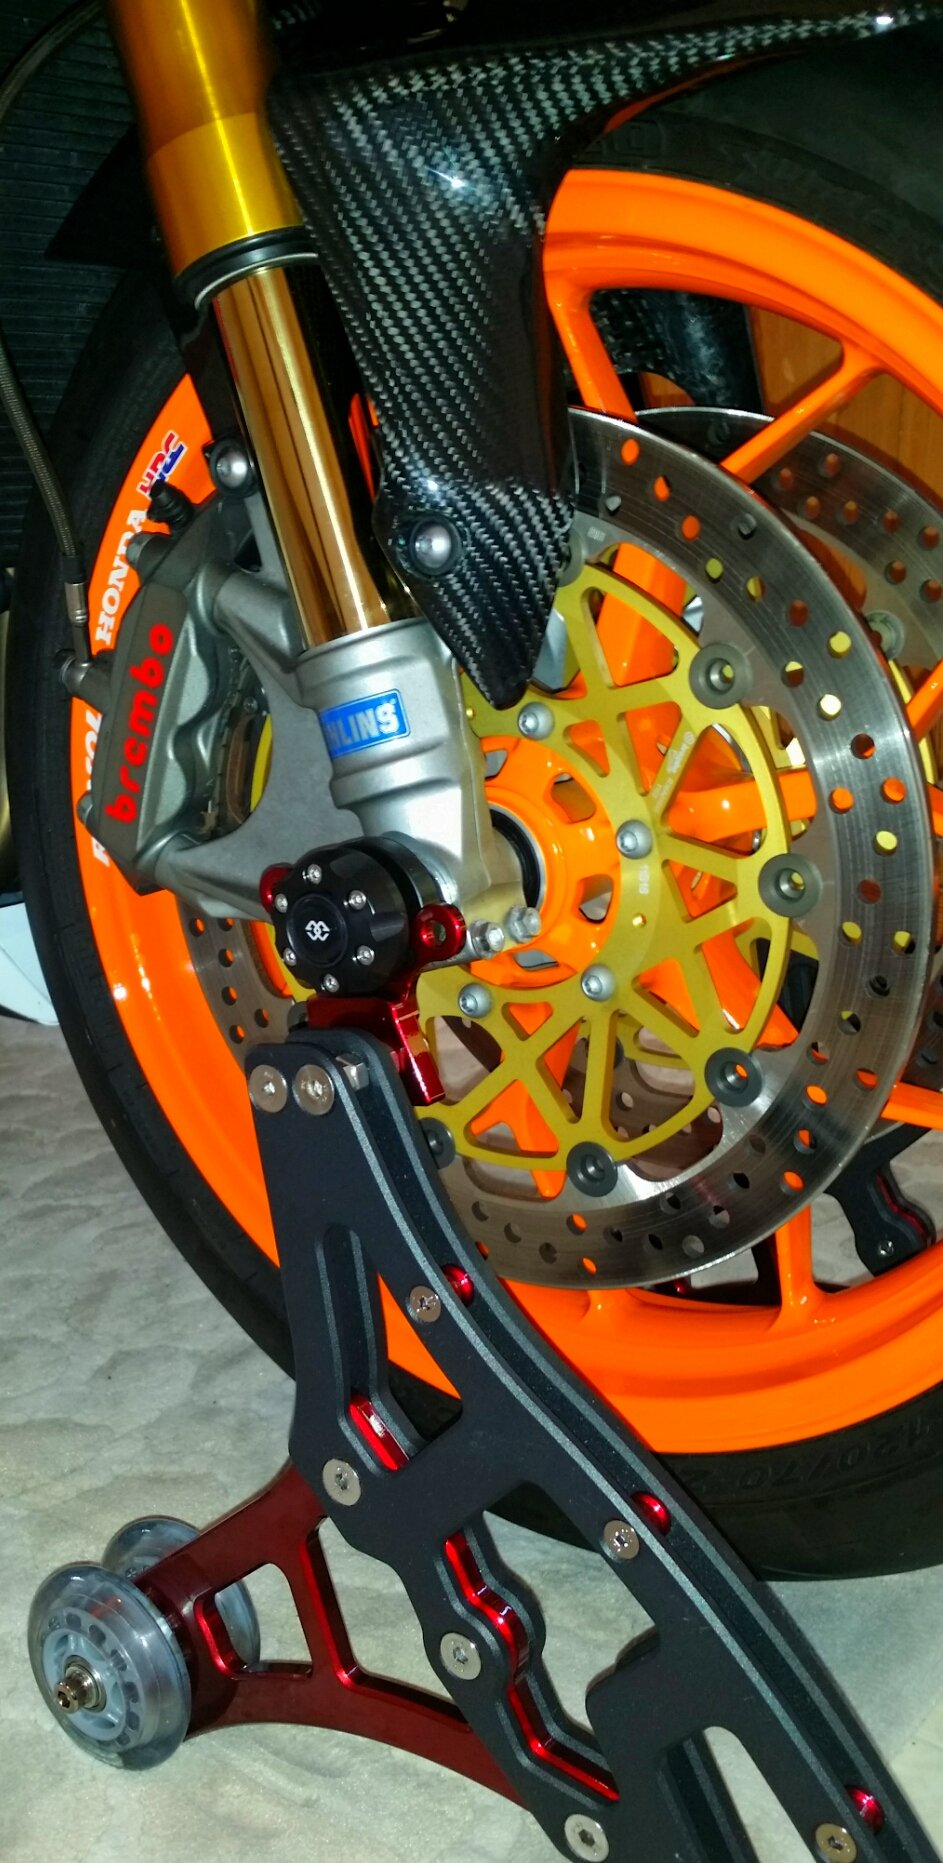 Galfer Wave Rear Brake Disc For Honda 2006 CBR1000RR-6 Fireblade